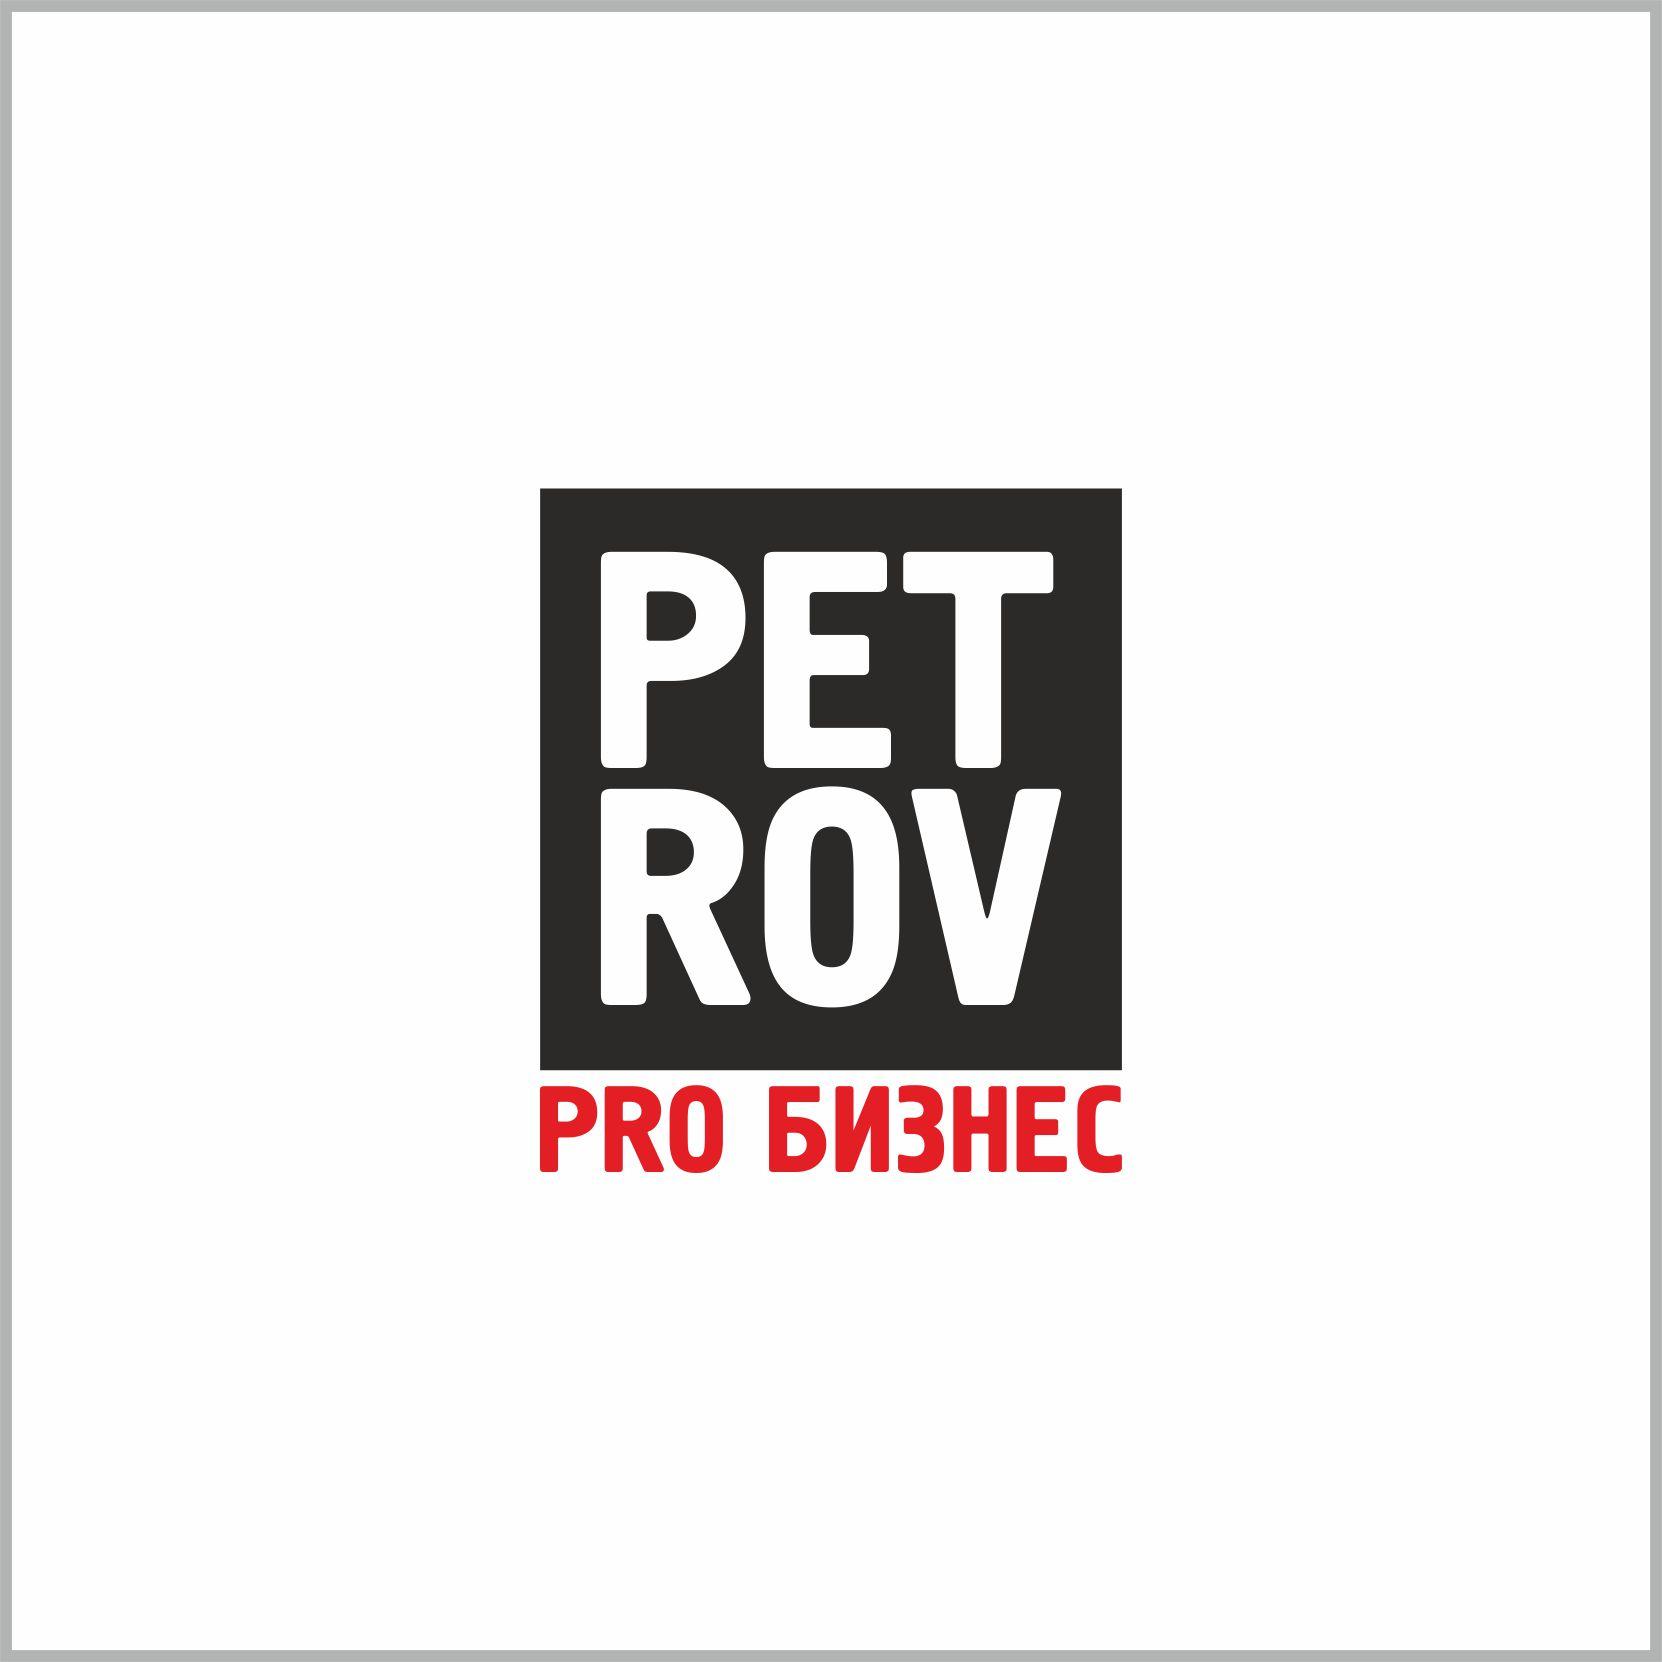 Создать логотип для YouTube канала  фото f_2045bfd2a0318257.jpg